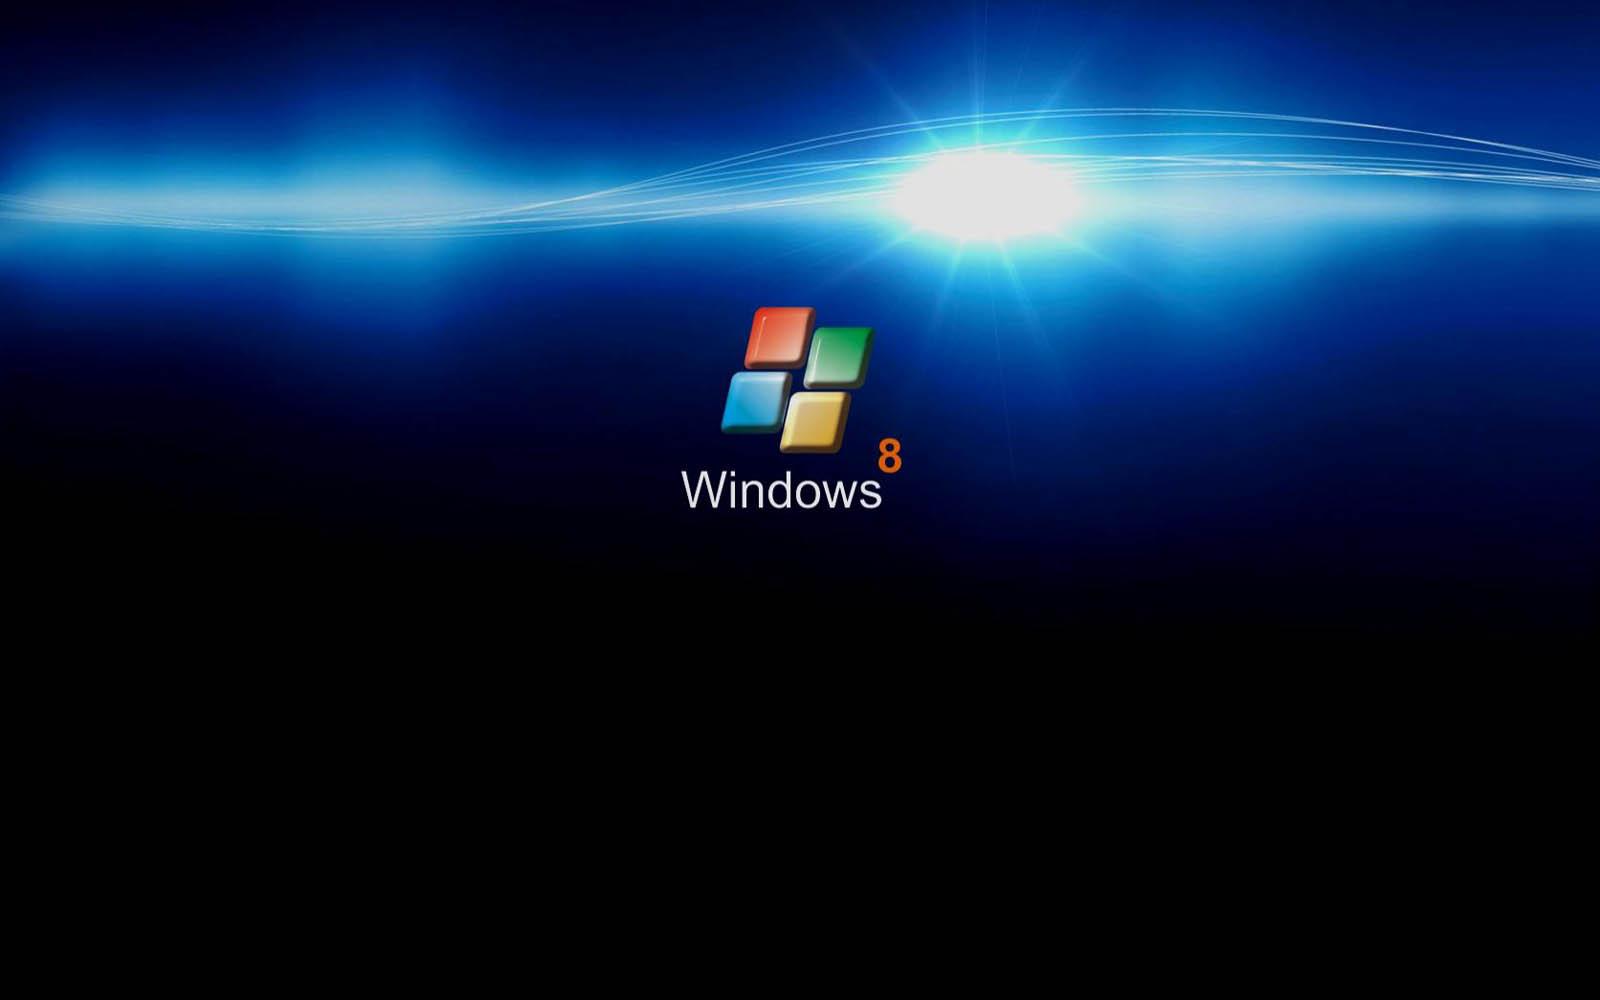 http://4.bp.blogspot.com/-4oE4brgimX8/UJUL1nI3ufI/AAAAAAAANNg/j-CXiA9YUoY/s1600/Windows%2B8%2BDesktop%2BWallpapers%2Band%2BBackgrounds.jpg